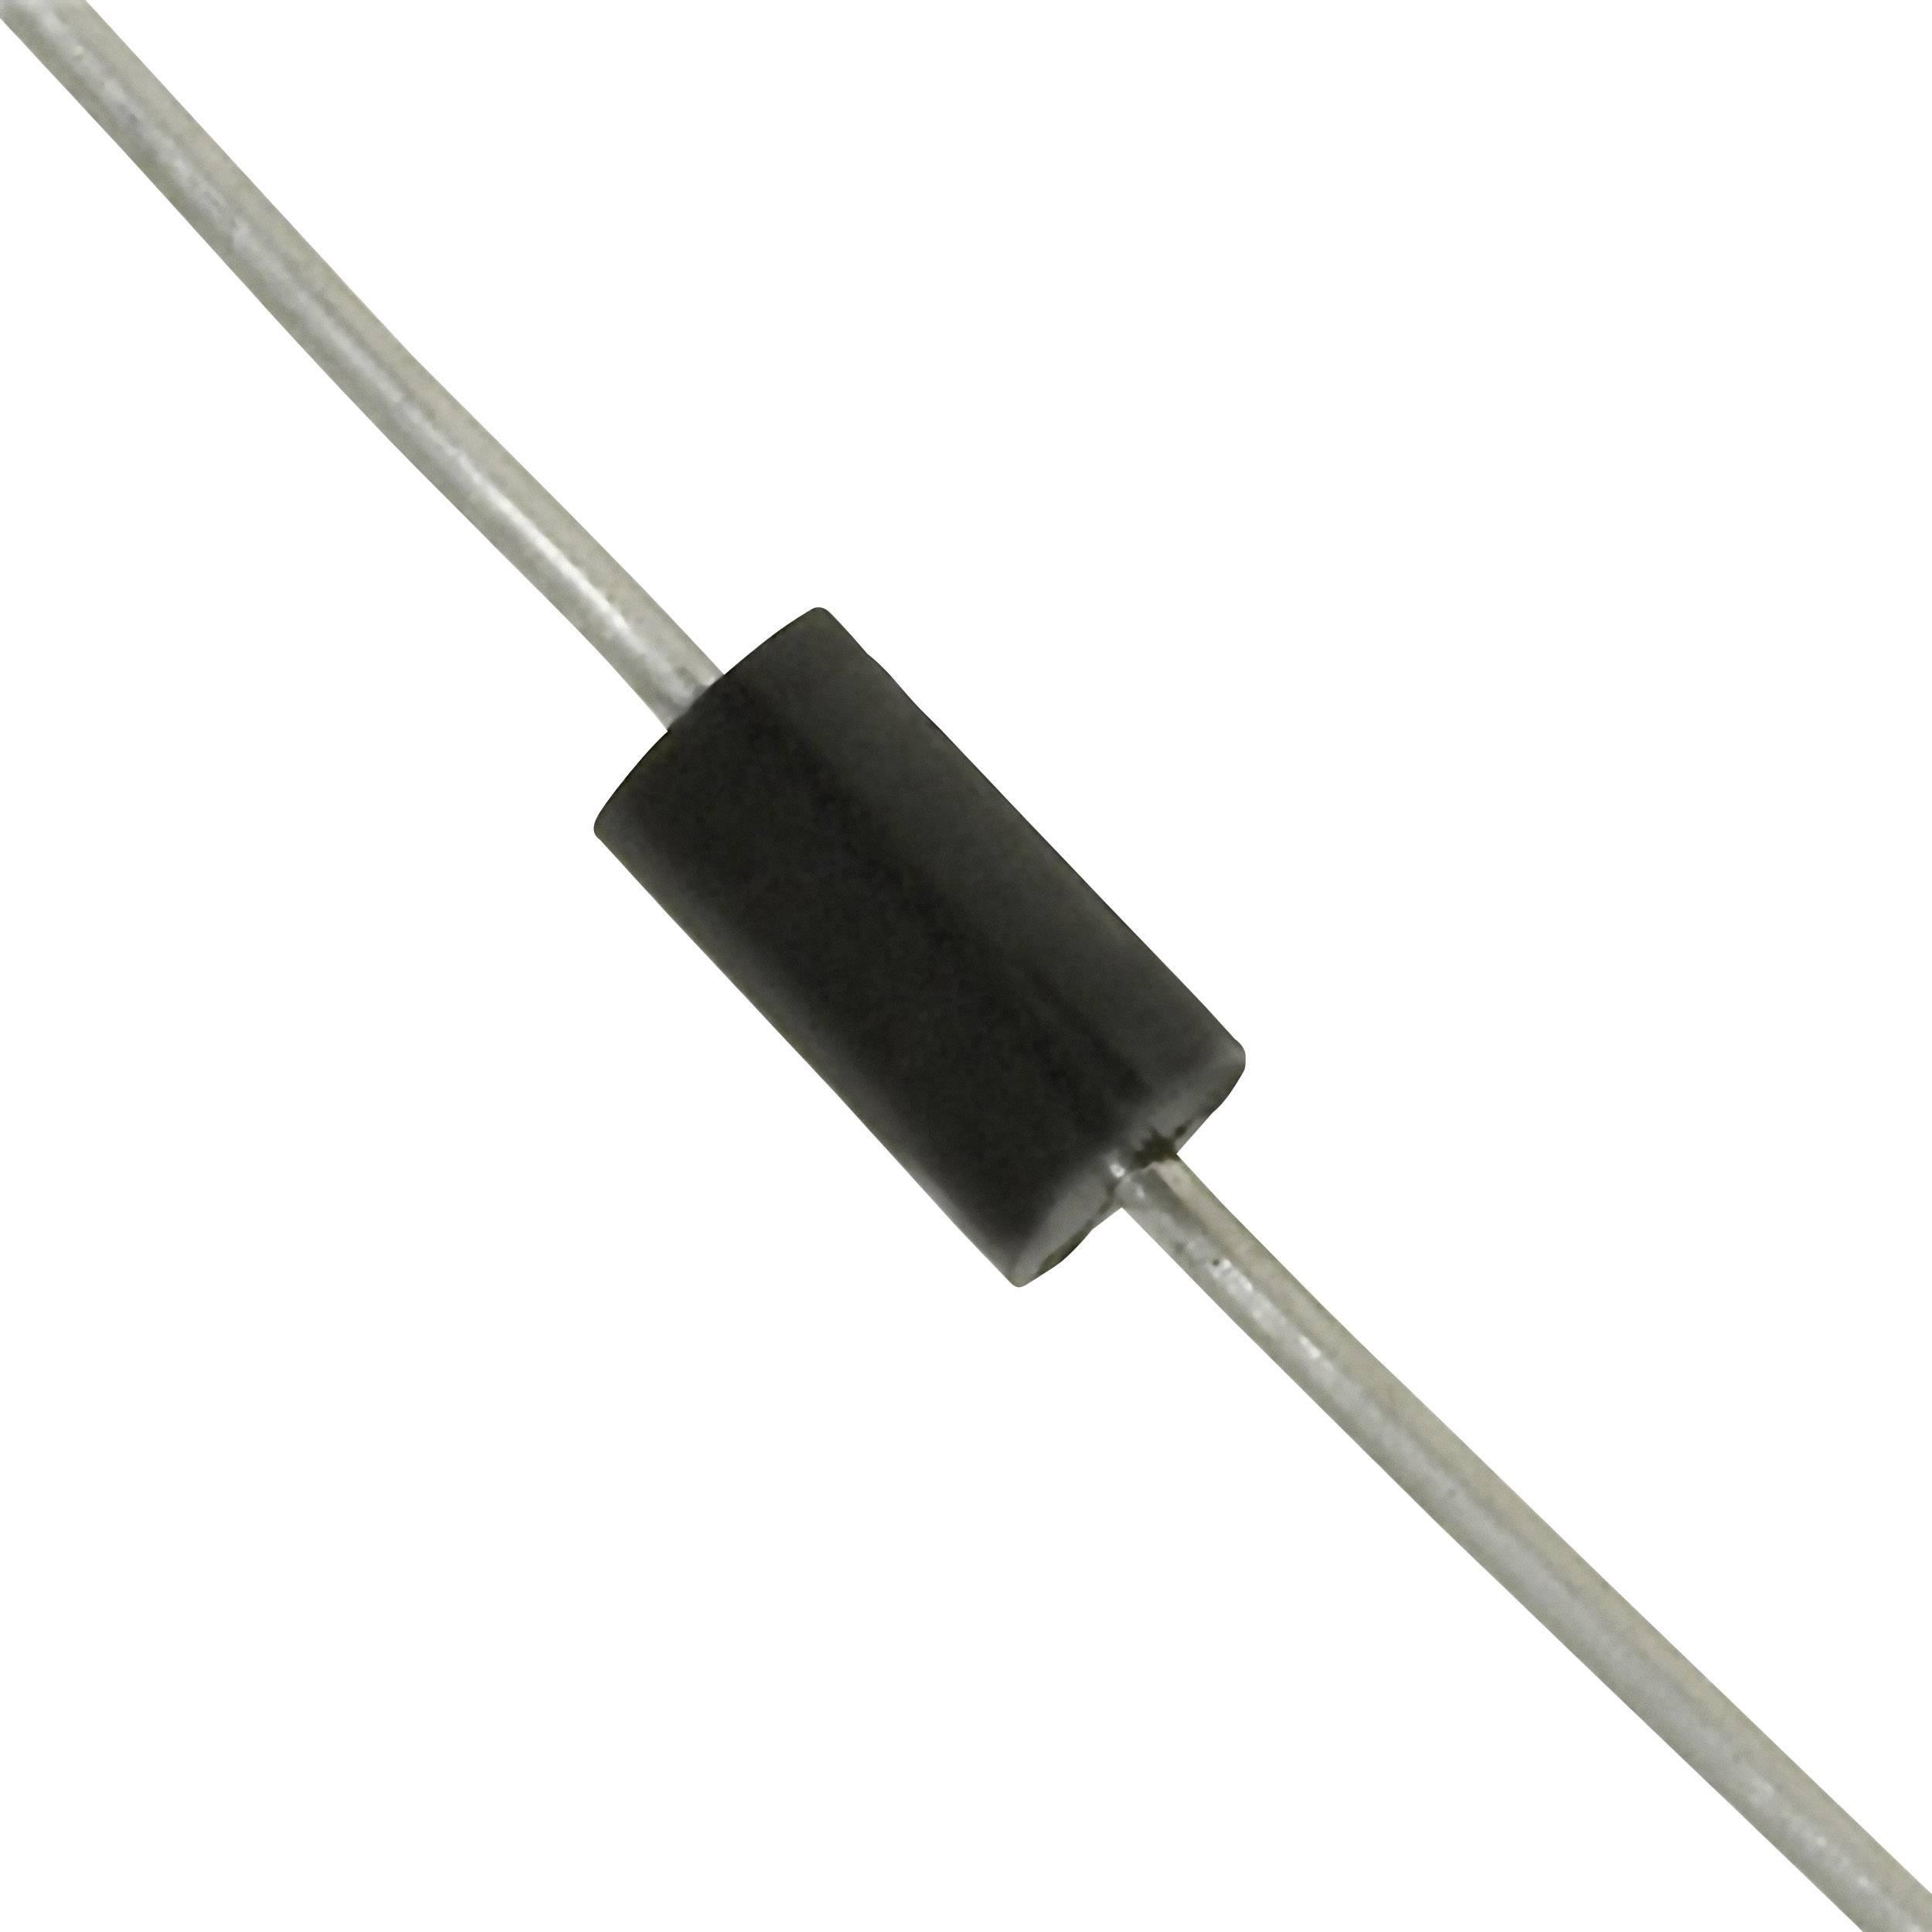 TVS dioda Diotec BZW 06-33 B (BZW06-33B), U(Db) 39 V, I(PP) 11.1 A